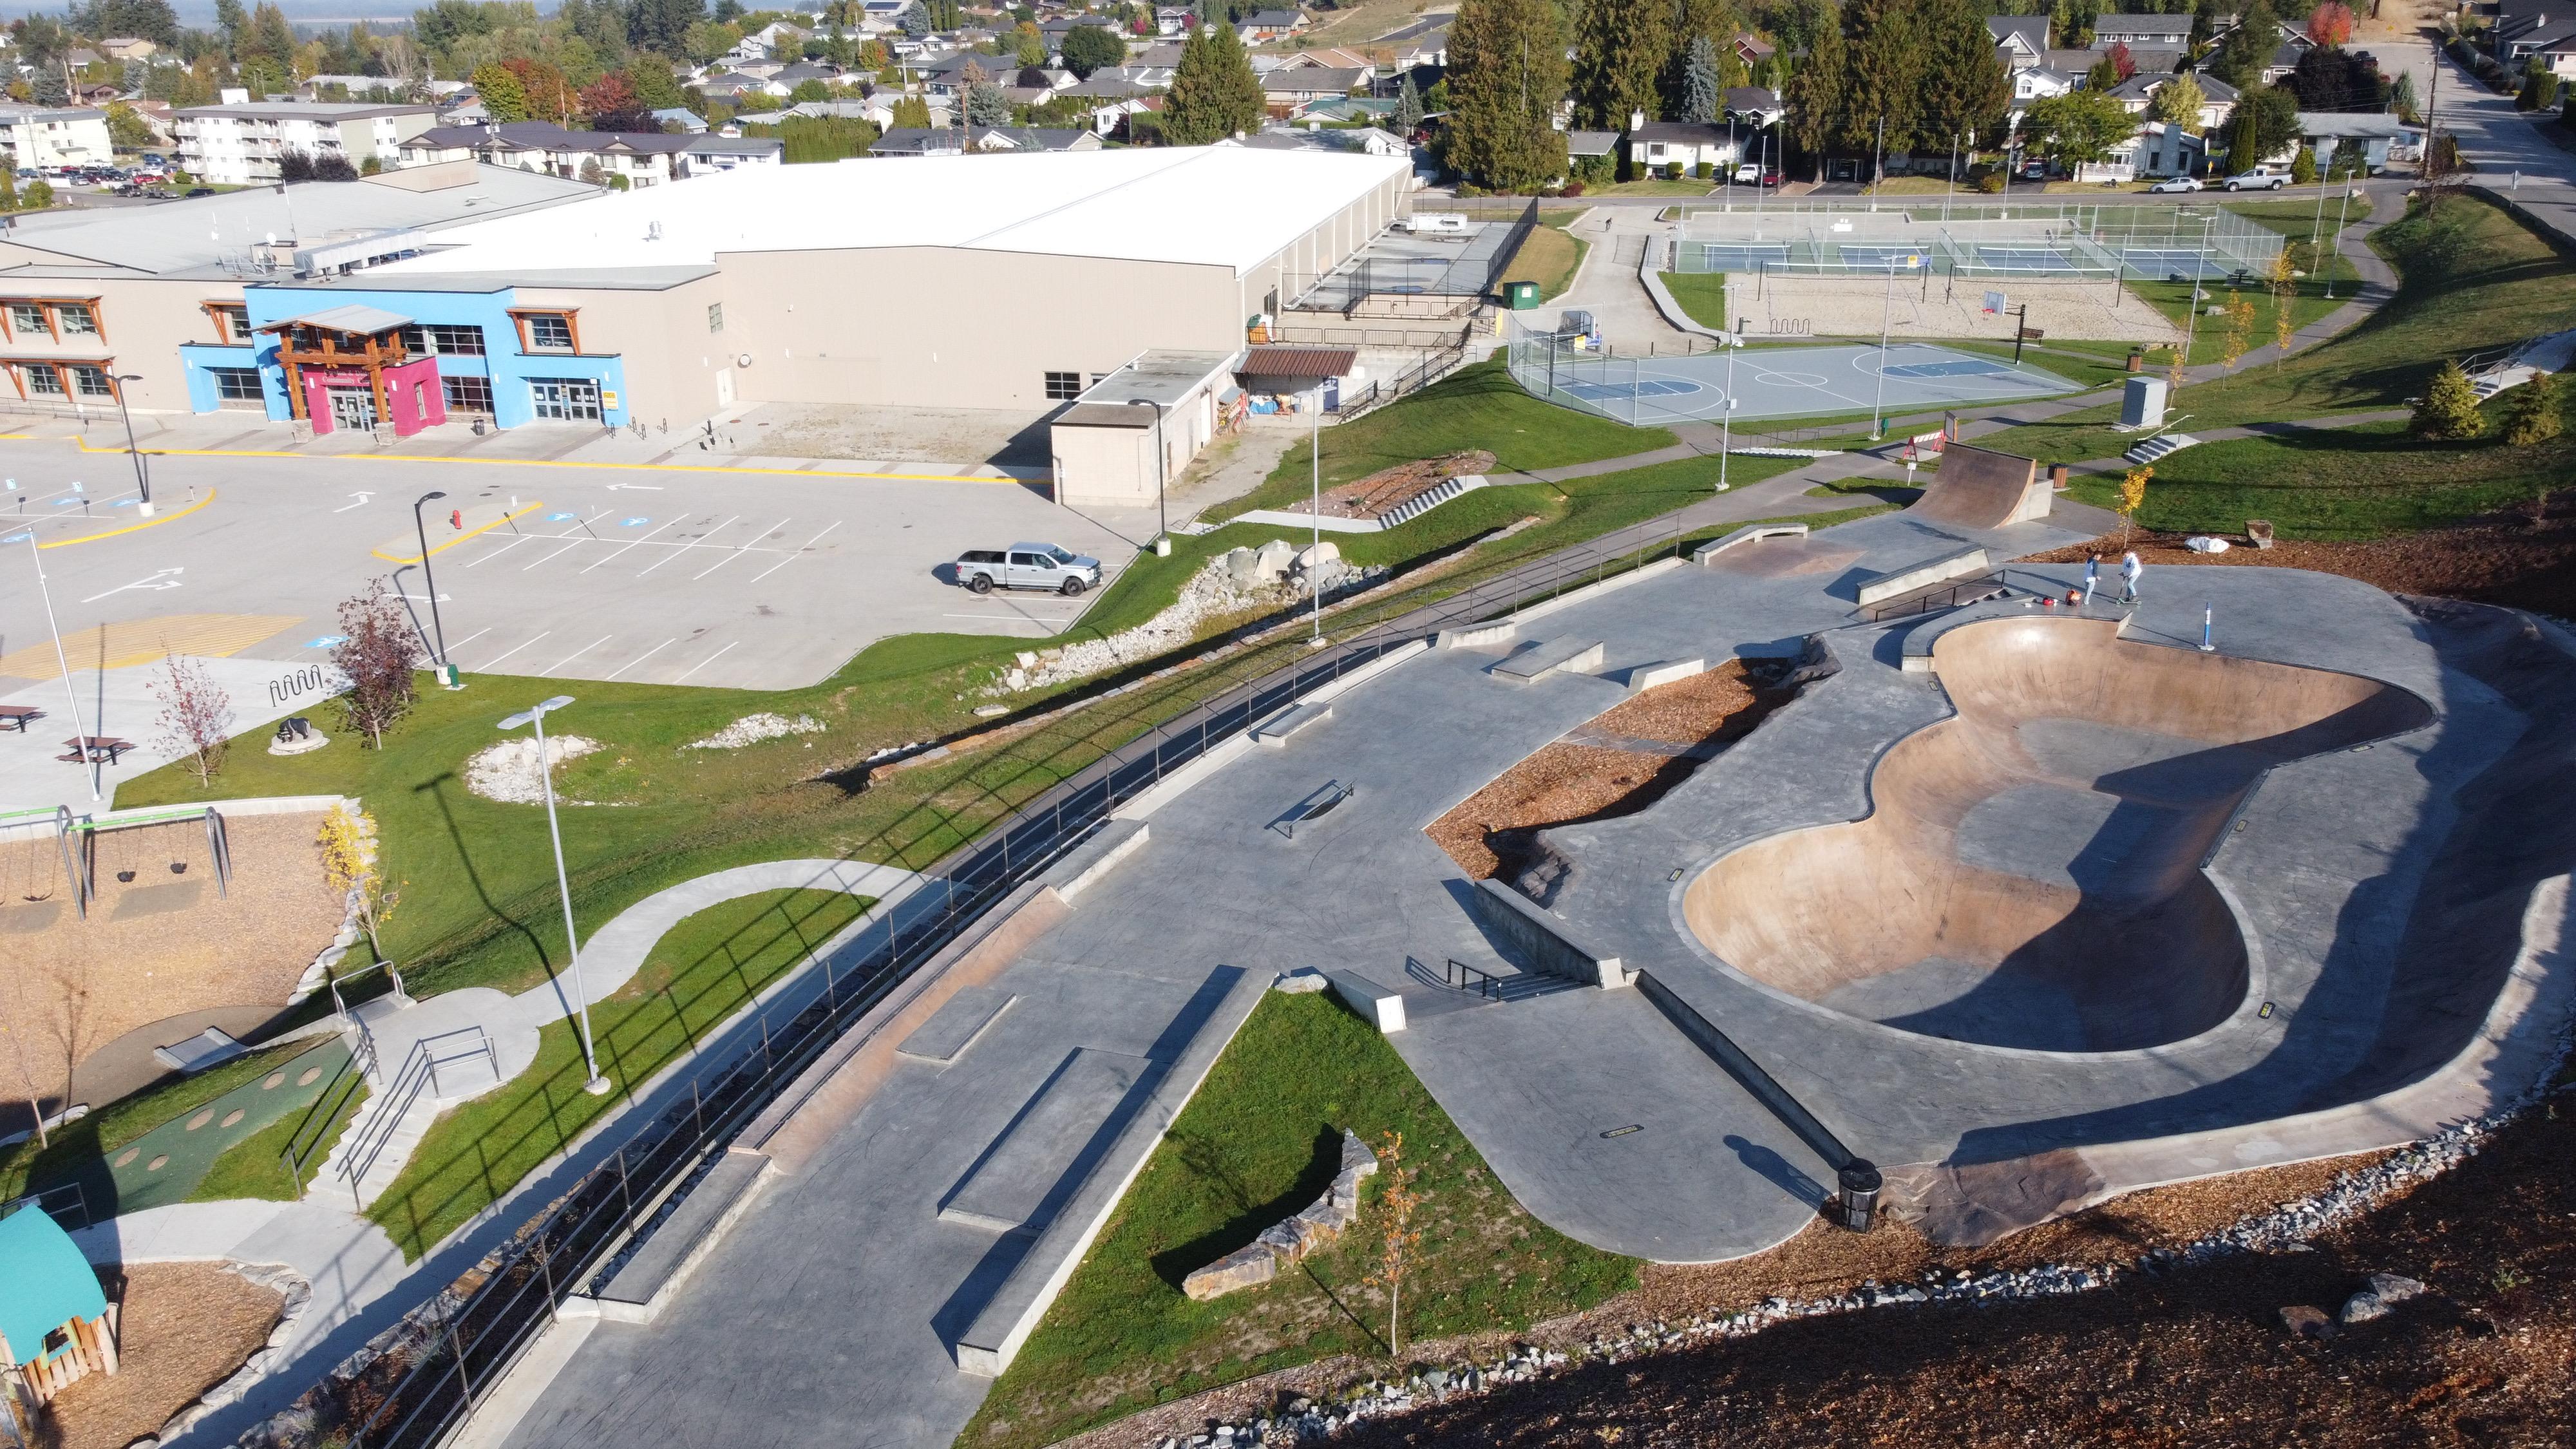 Creston Skate Park